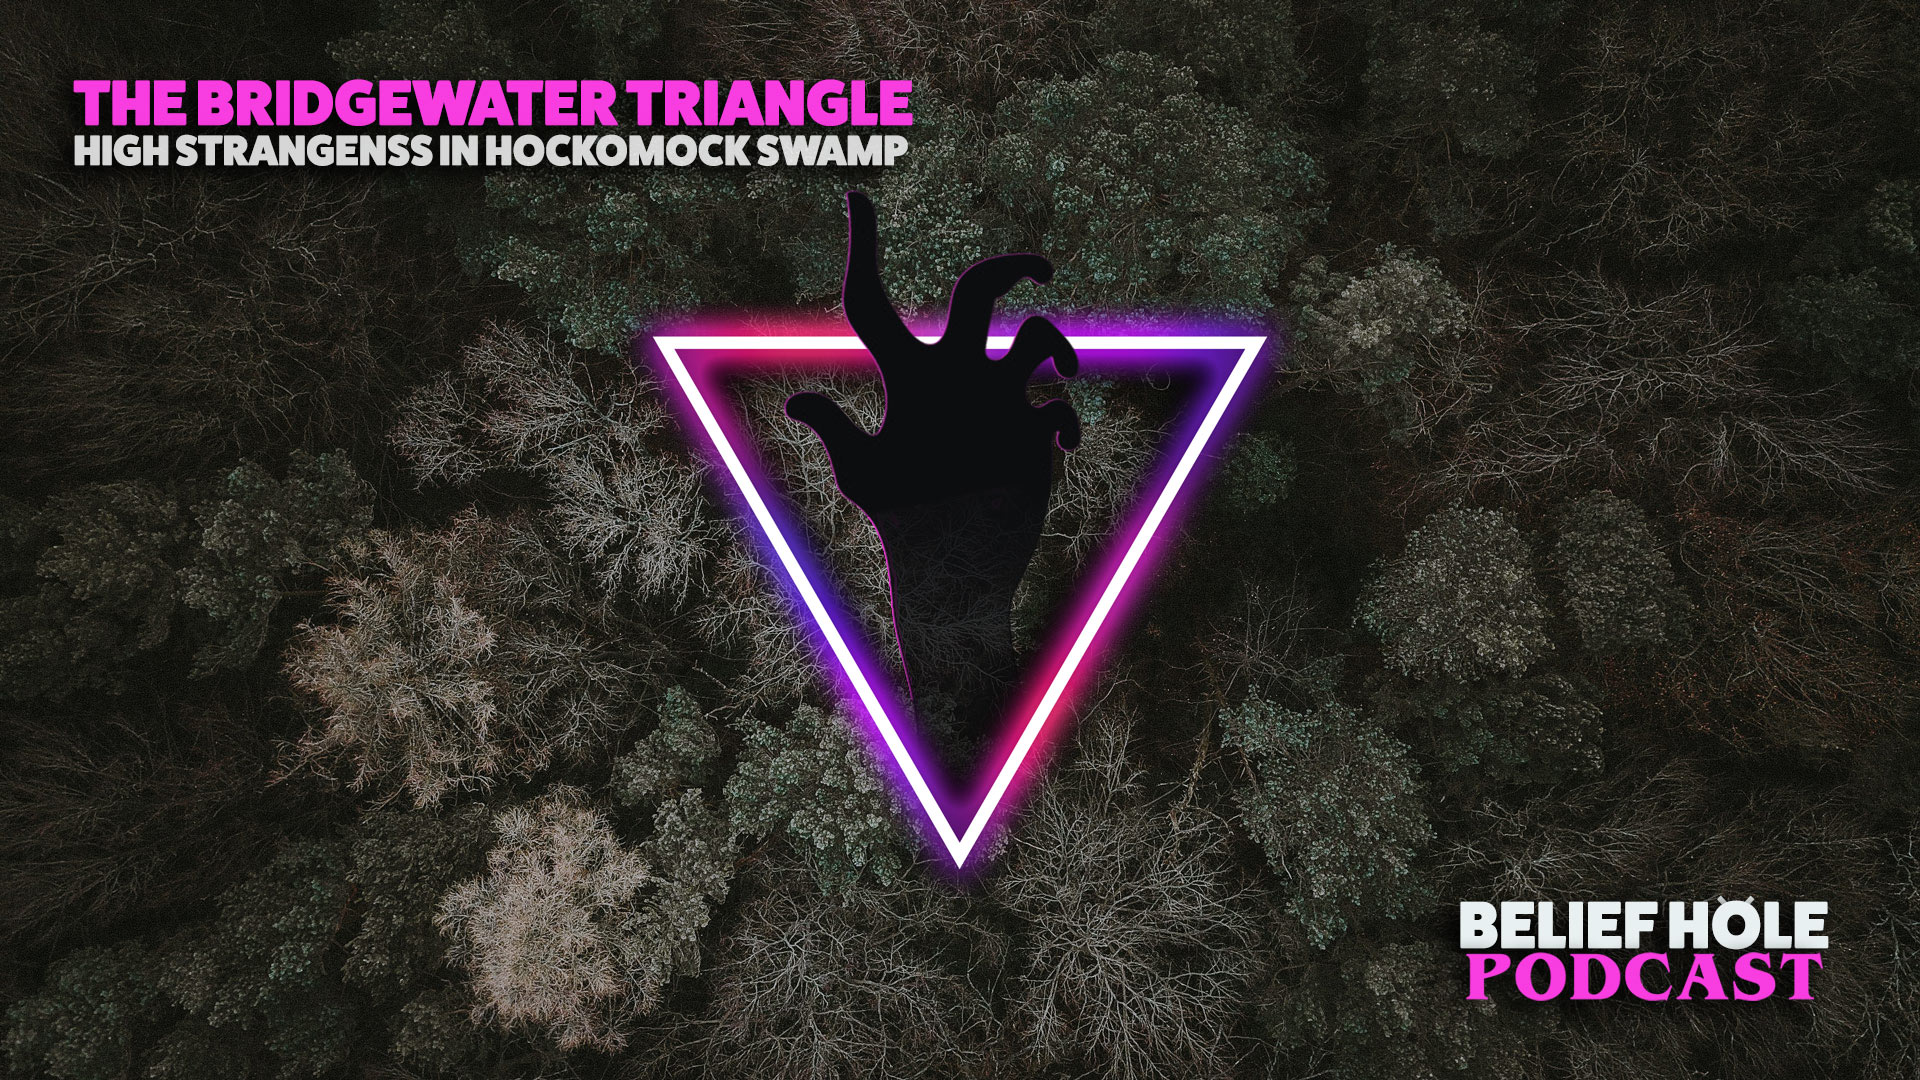 3.05 | Bridgewater Triangle – Puckwudgies and Paranormal in Hockomock Swamp